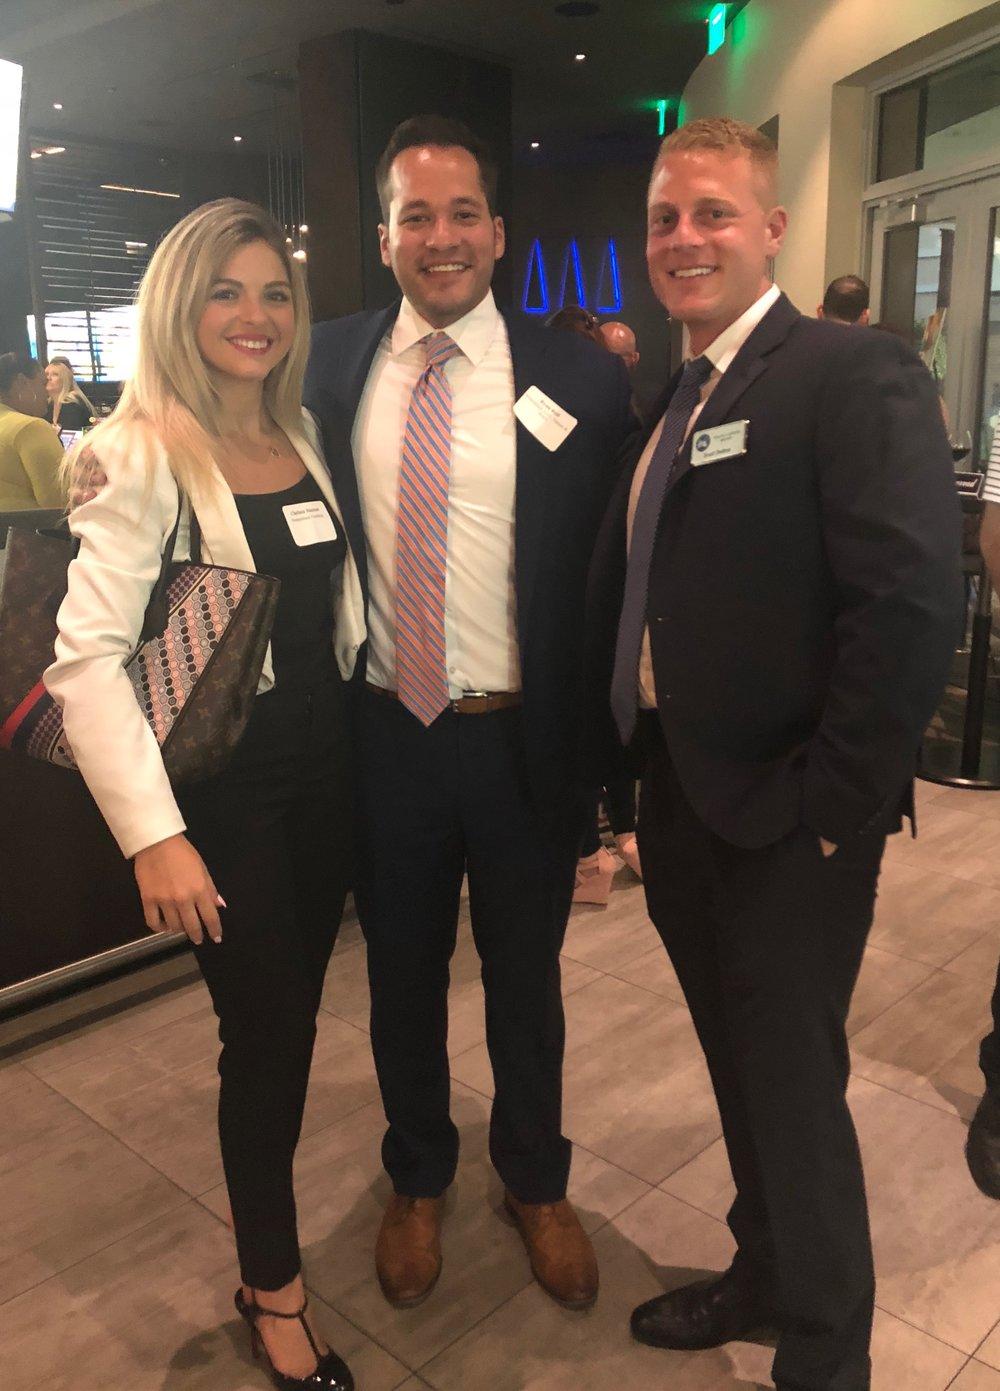 Chelsea Hanson, Ryan Reif, and Scott Dalto